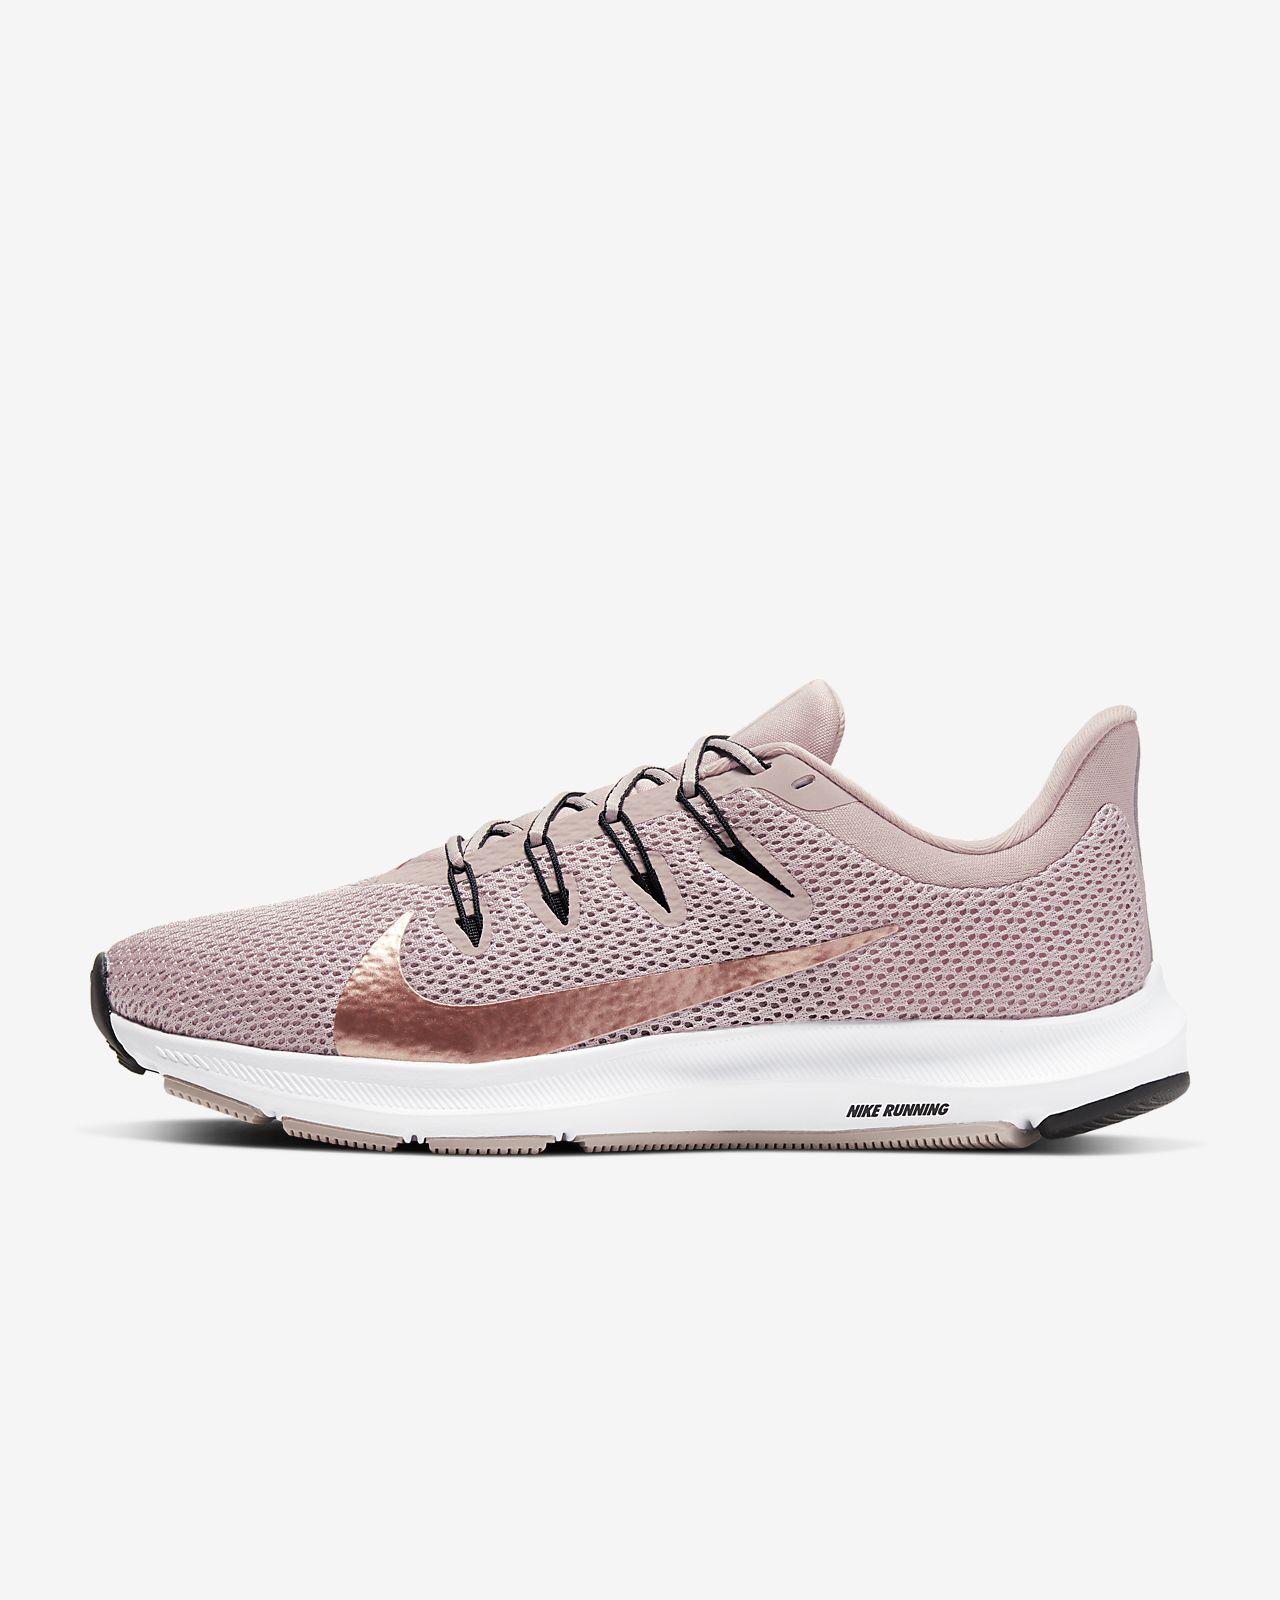 Original Nike WMNS NIKE AIR BELLA TR Women Running Shoes New Arrival Sneakers Making Discounts